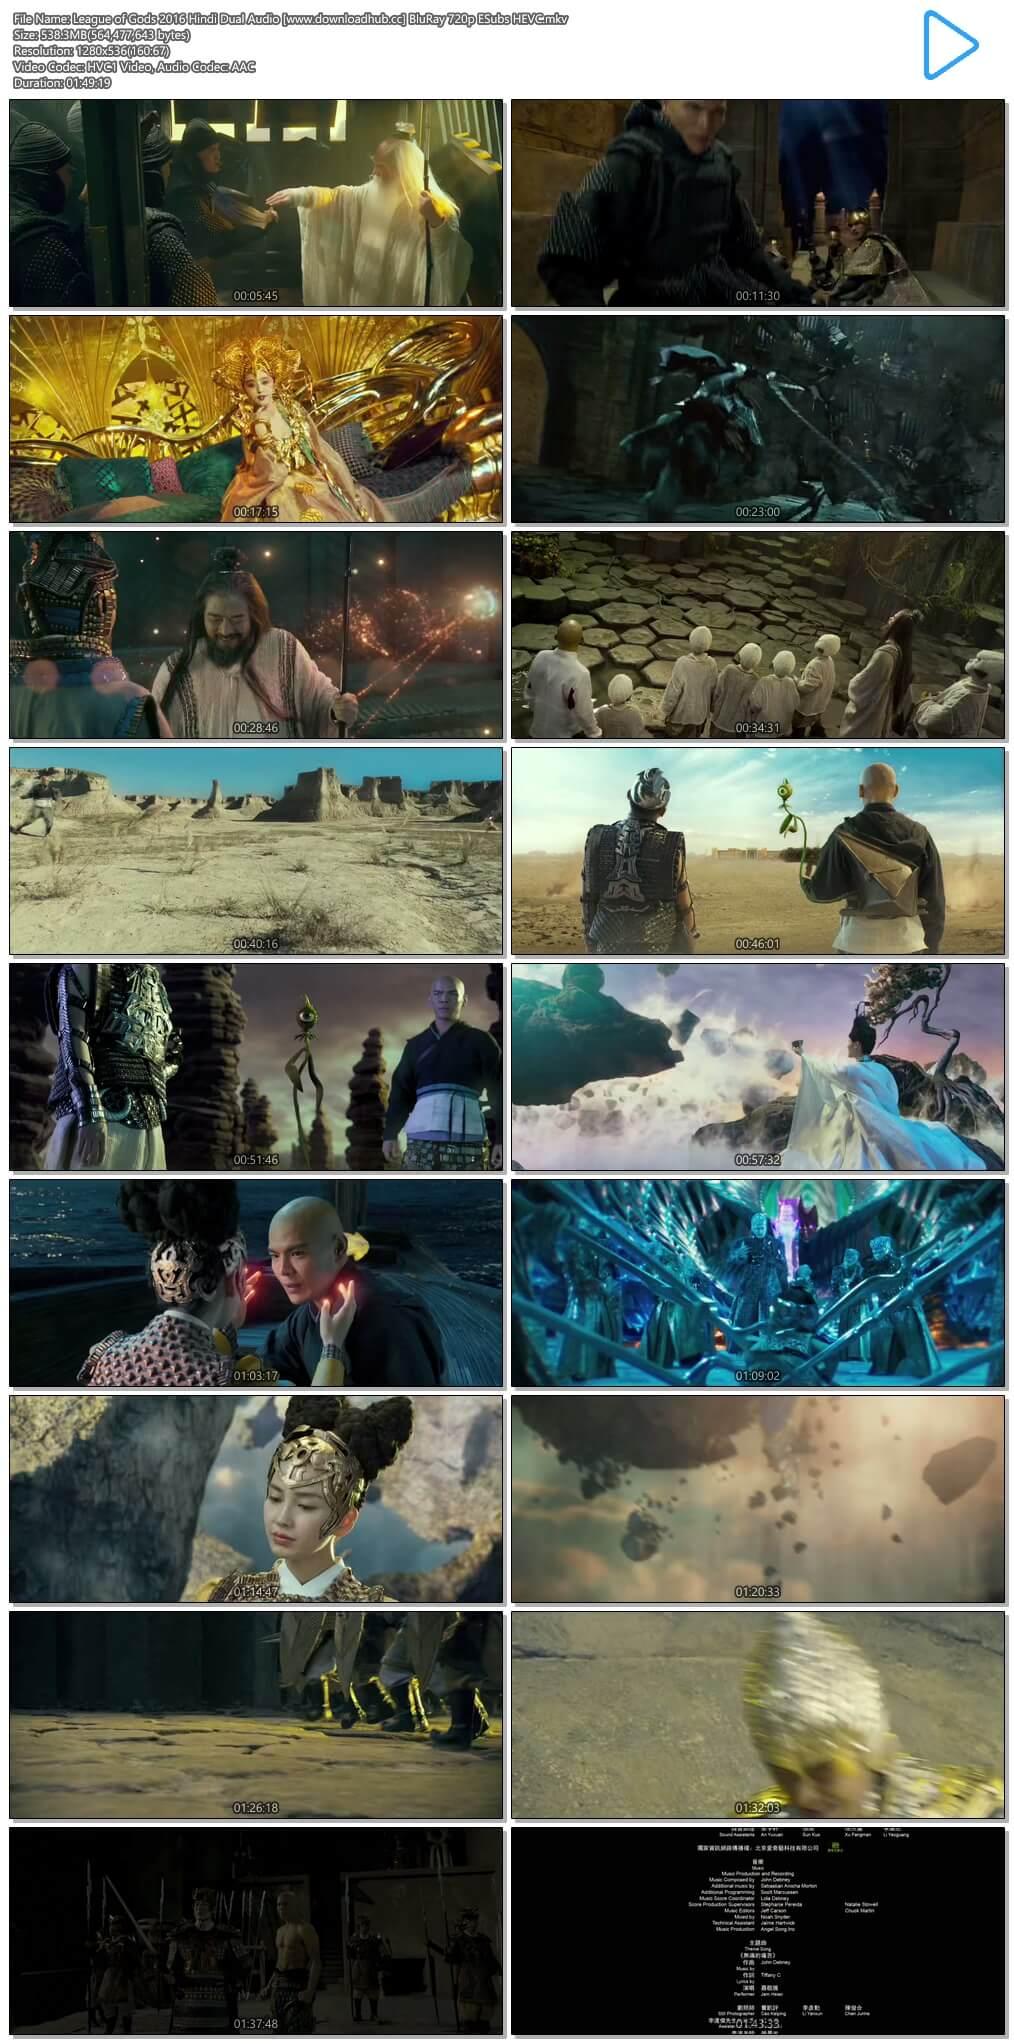 League of Gods 2016 Hindi Dual Audio 500MB BluRay 720p ESubs HEVC